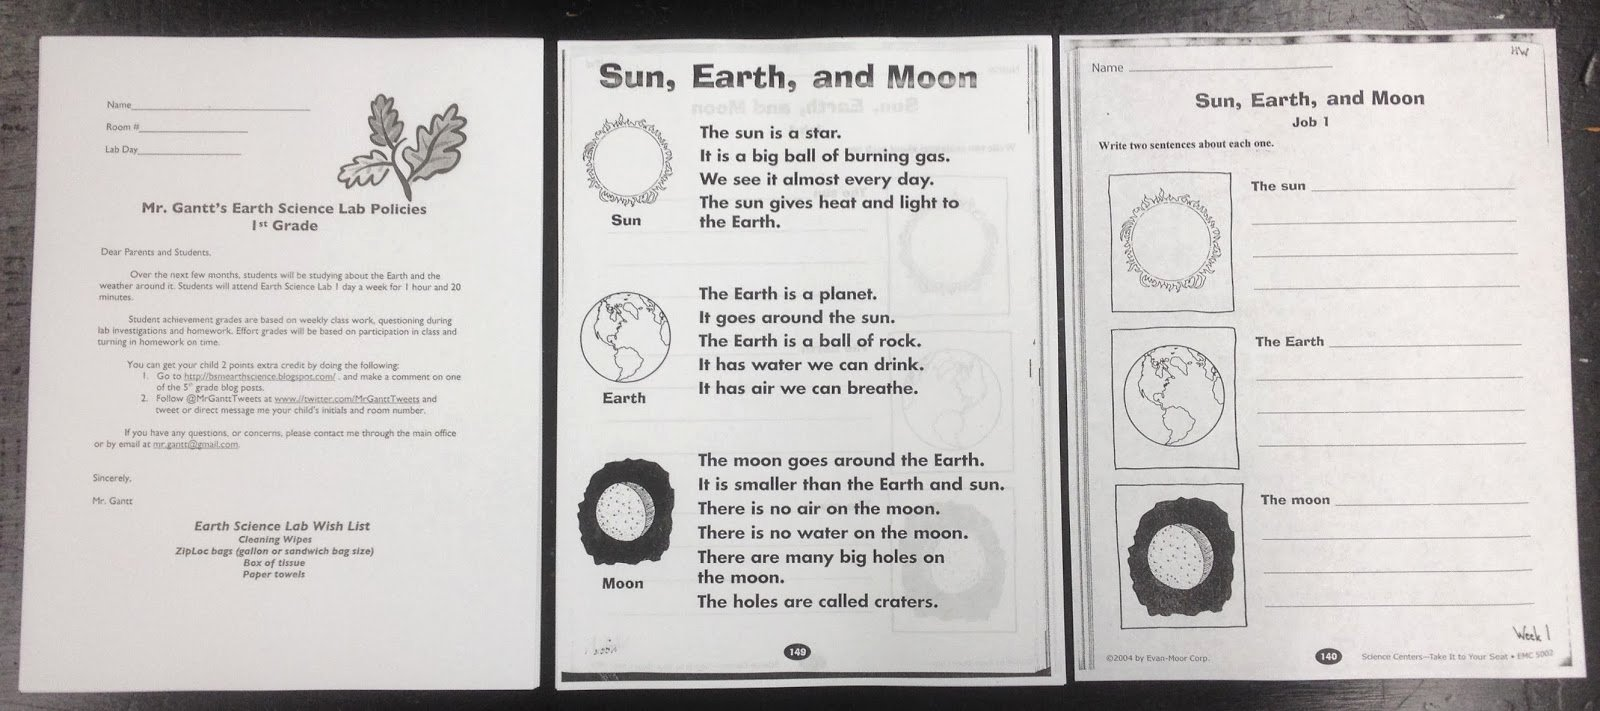 Science Worksheet for 1st Grade Luxury Mr Gantt S Earth Science Lab Blog 1st Grade Week 1 Sun